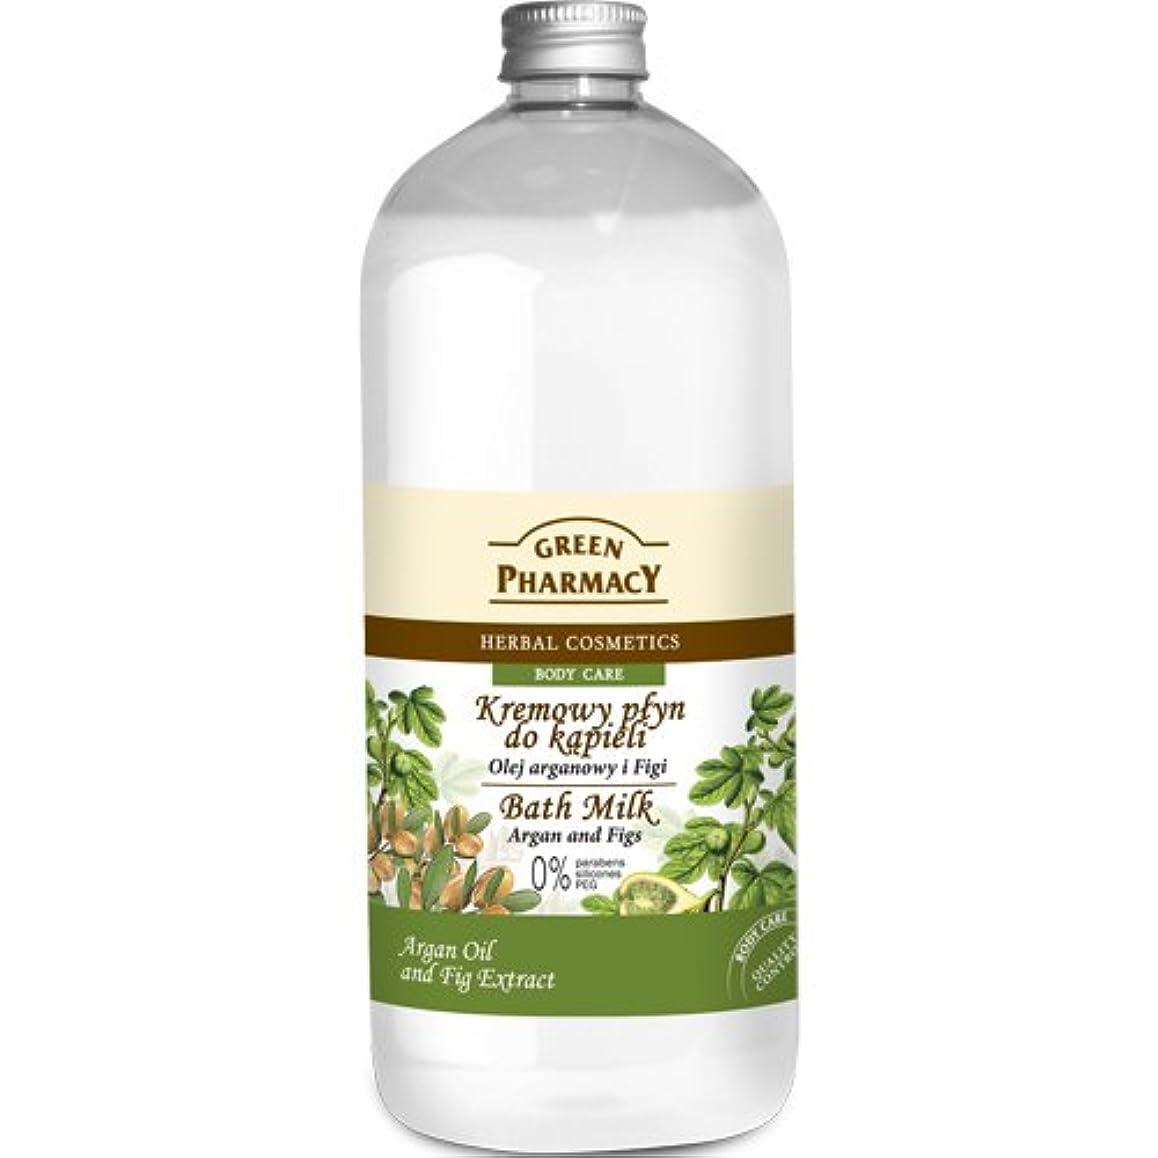 Elfa Pharm Green Pharmacy グリーンファーマシー Bath Milk バスミルク Argan Oil&Figs